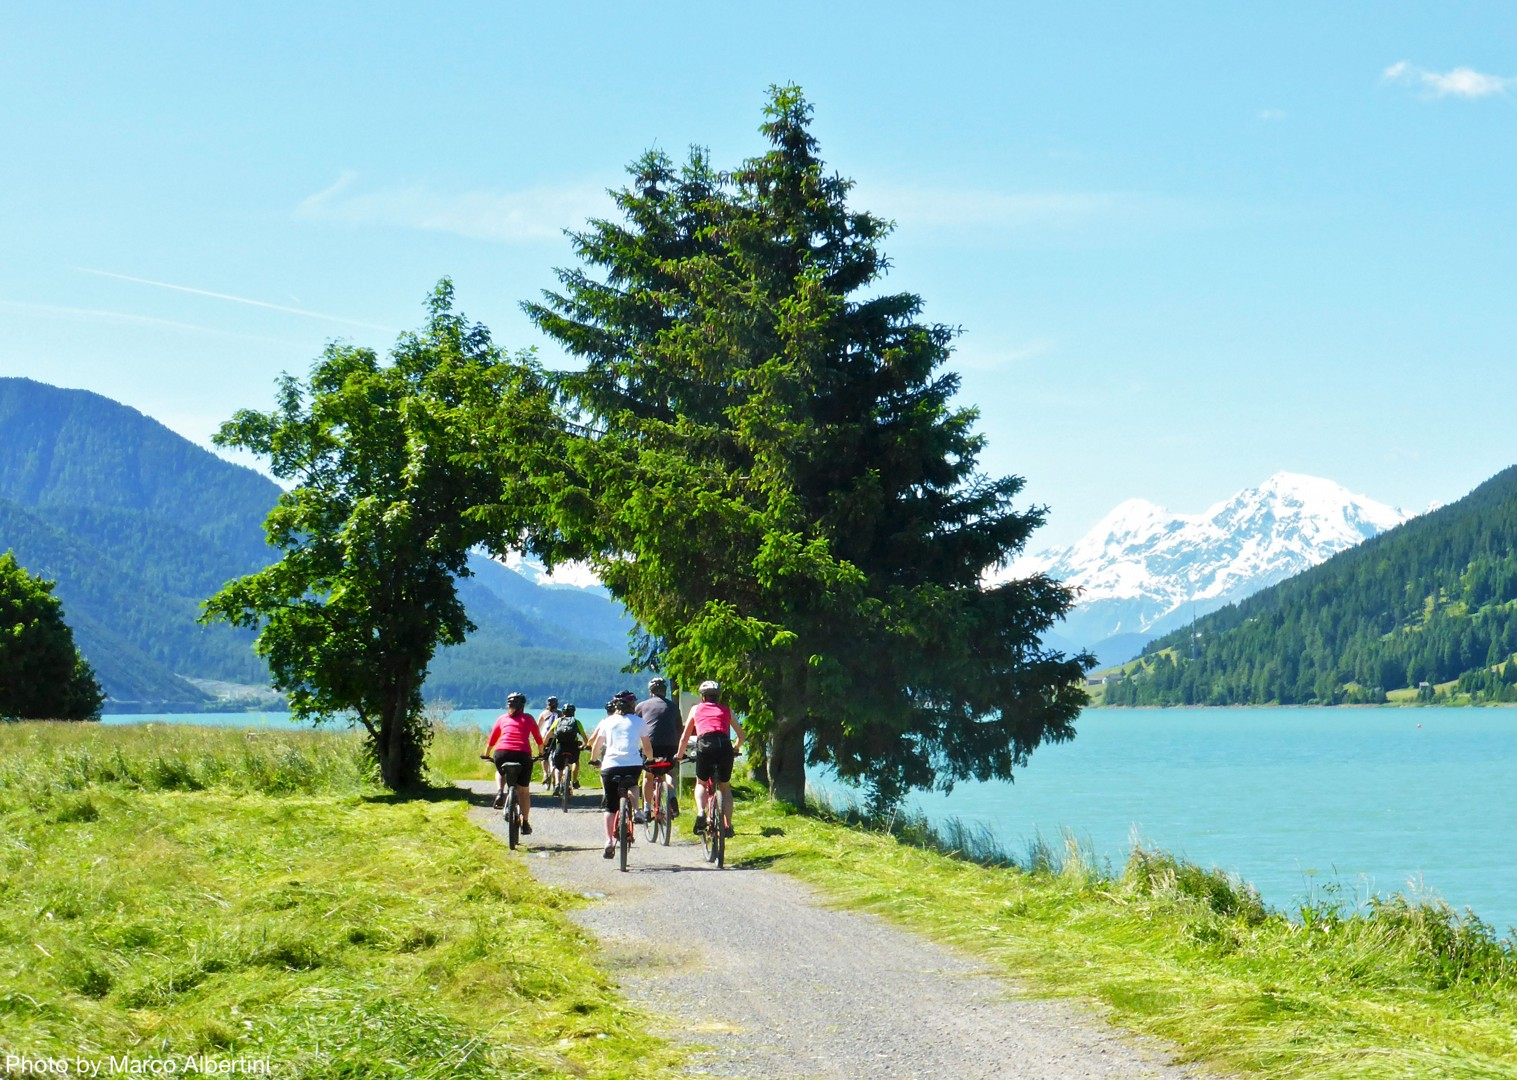 italian-guided-leisure-cycling-holiday.jpg - Austria and Italy - La Via Claudia - Guided Leisure Cycling Holiday - Leisure Cycling